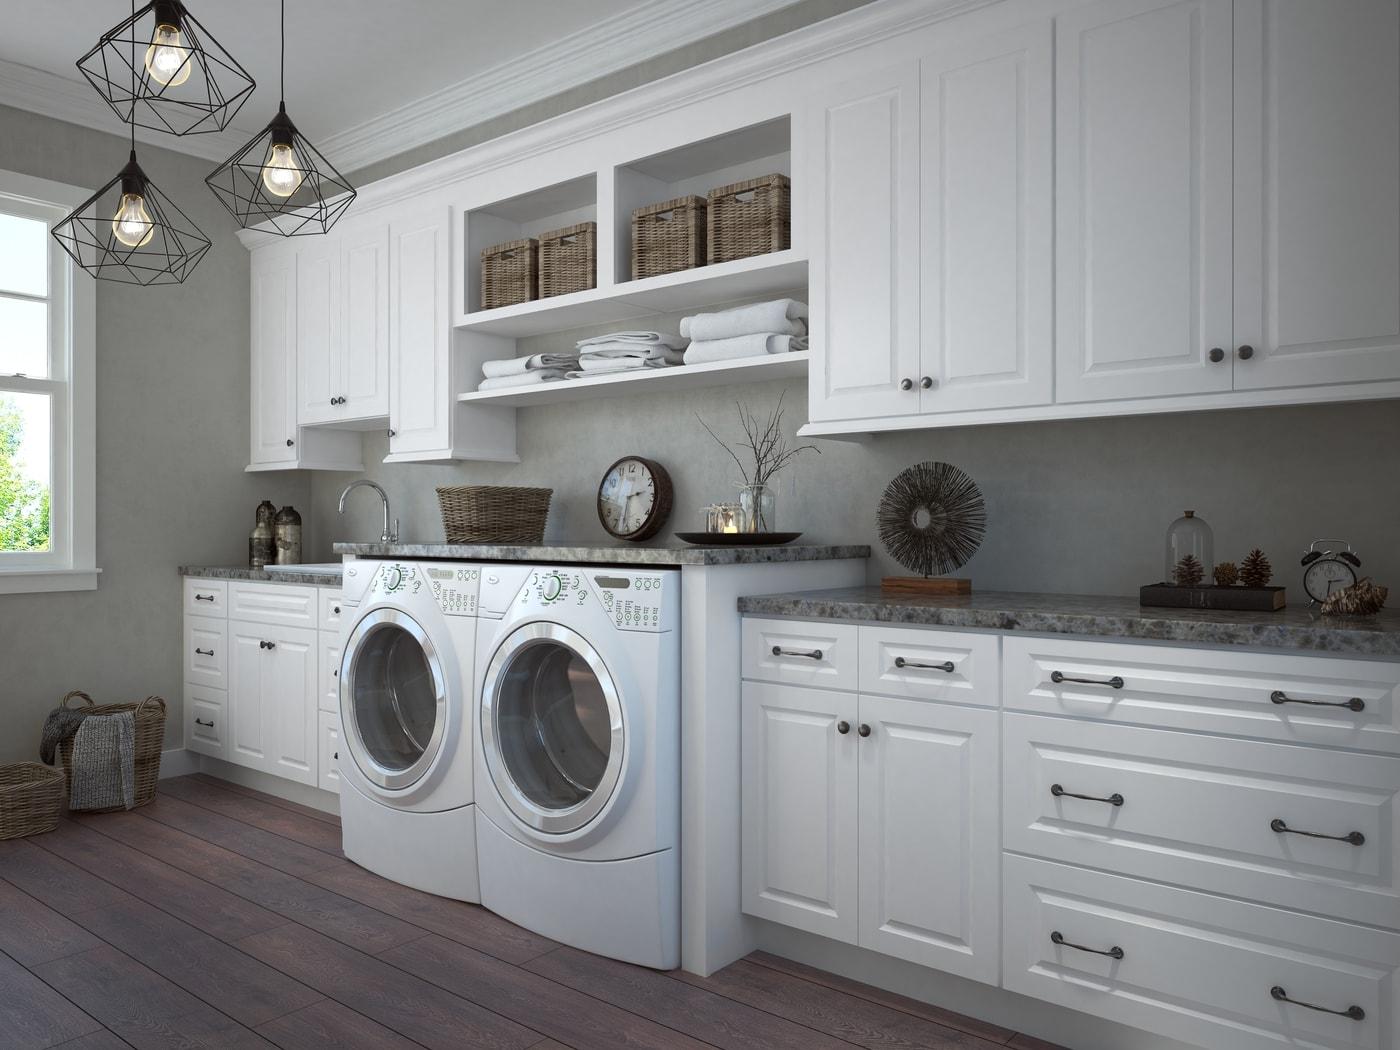 Dakota White Pre-Assembled Laundry Room Cabinets - The RTA ... on Laundry Room Cabinets  id=39469